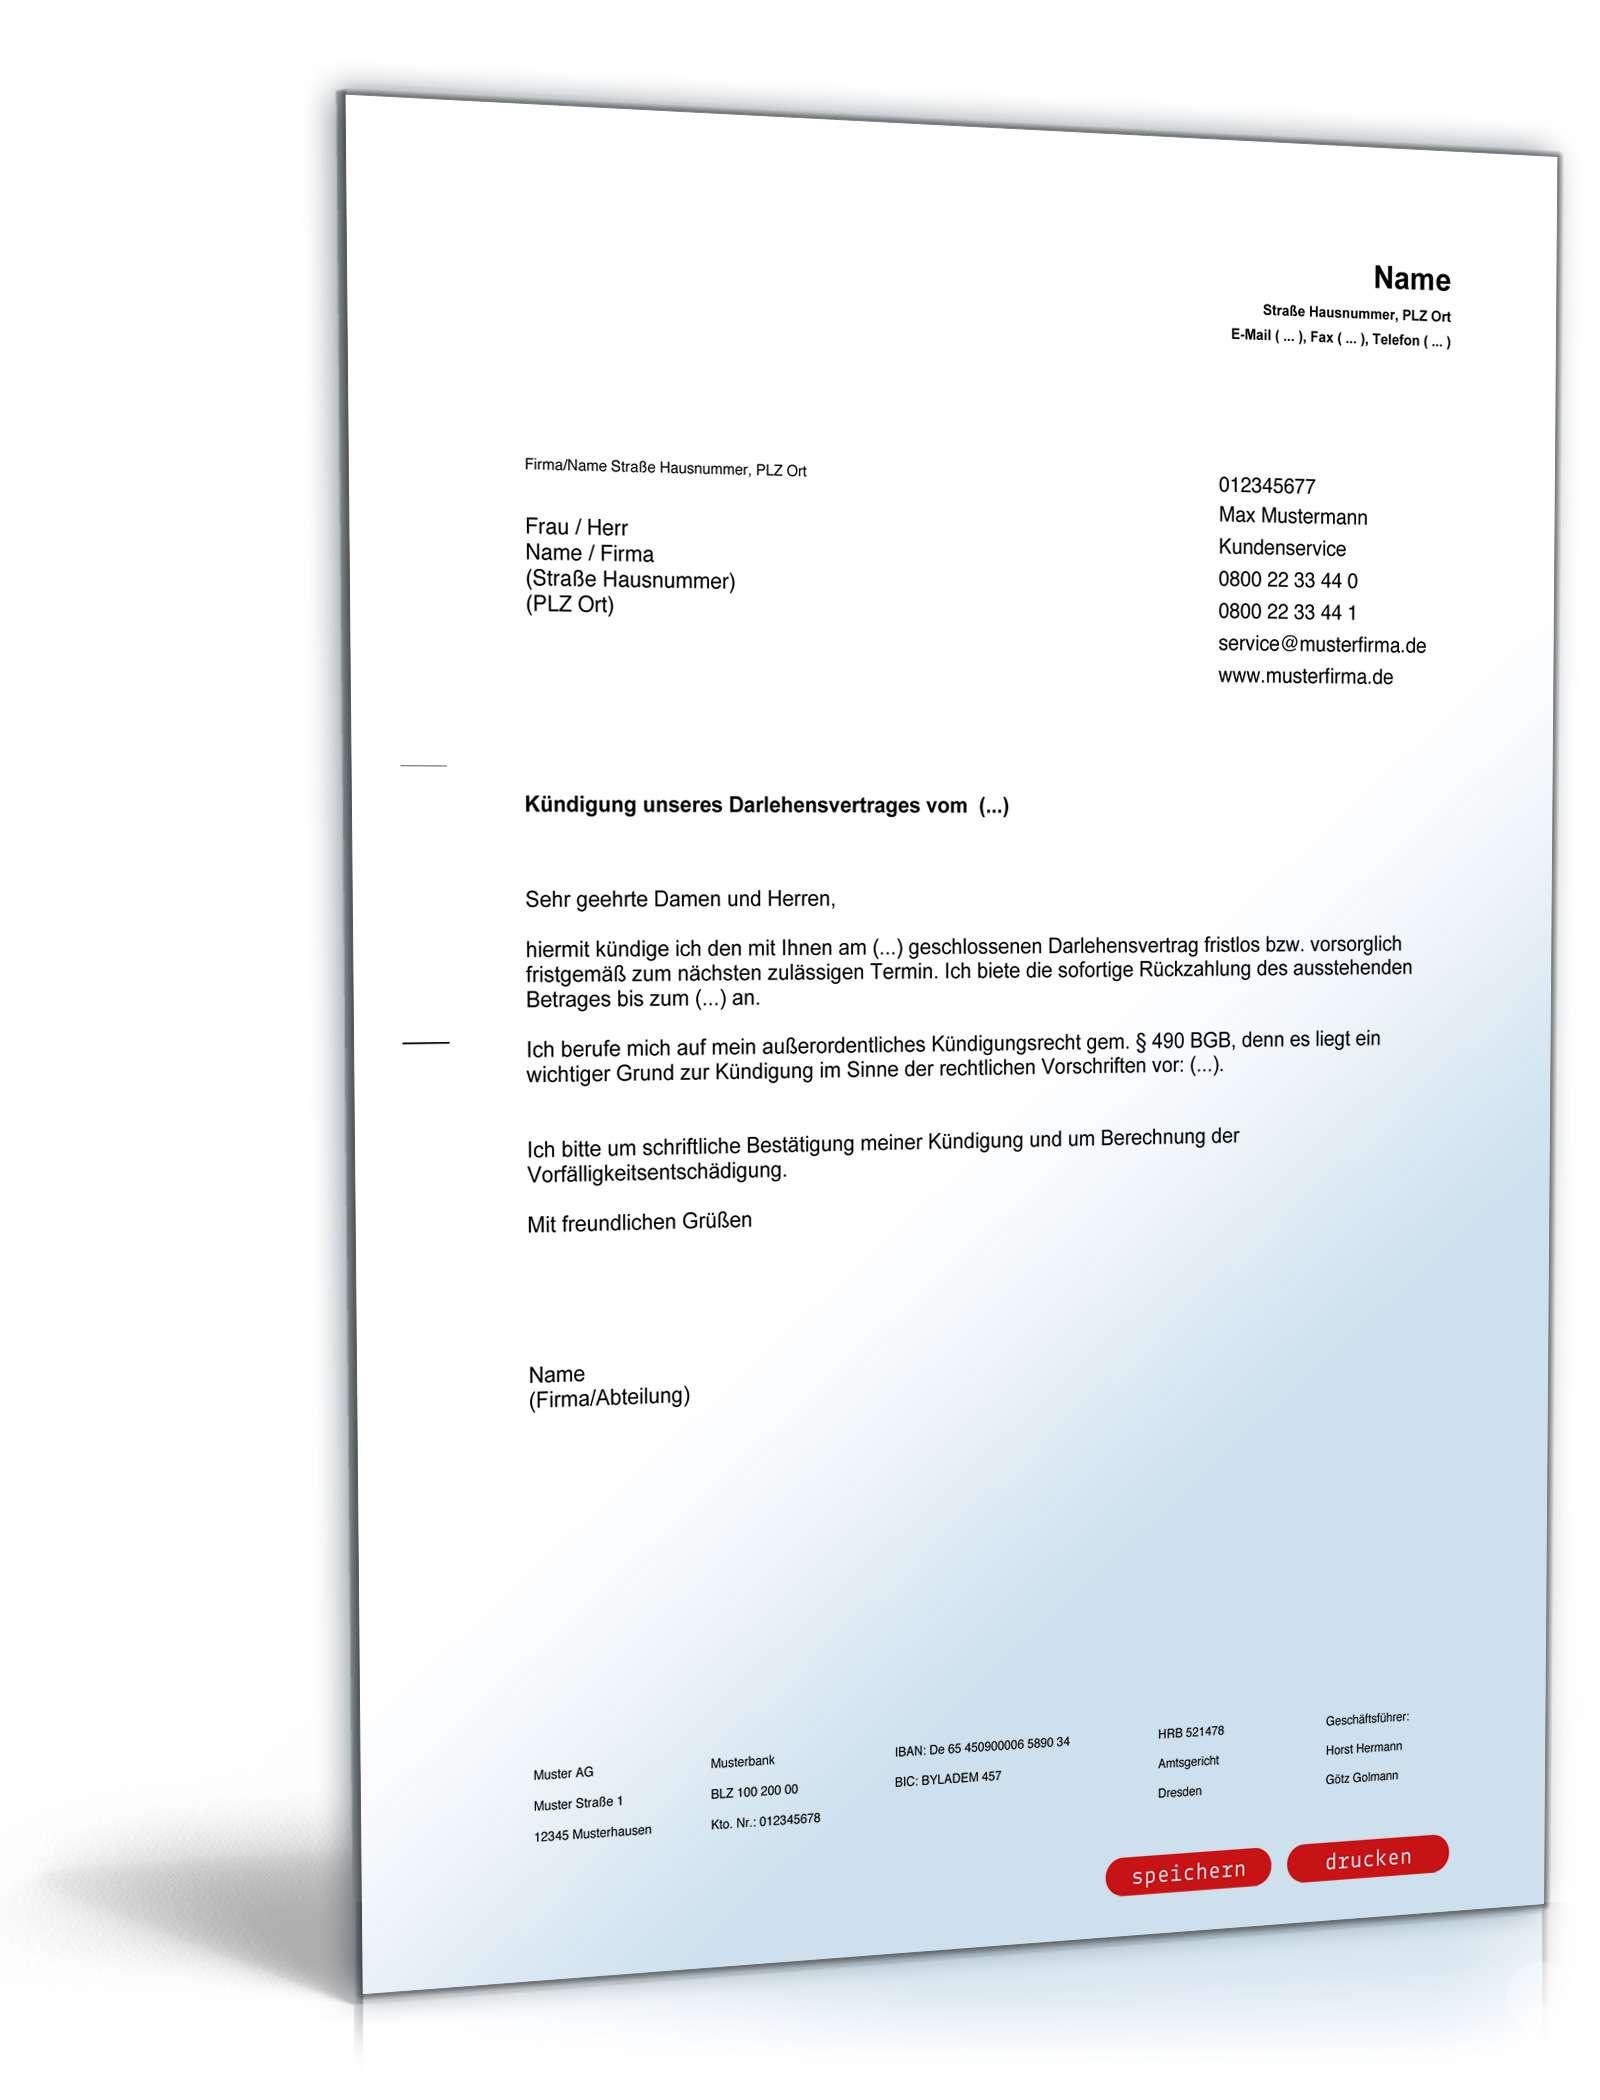 Groß Vorlage Eines Darlehensvertrags Fotos - Entry Level Resume ...